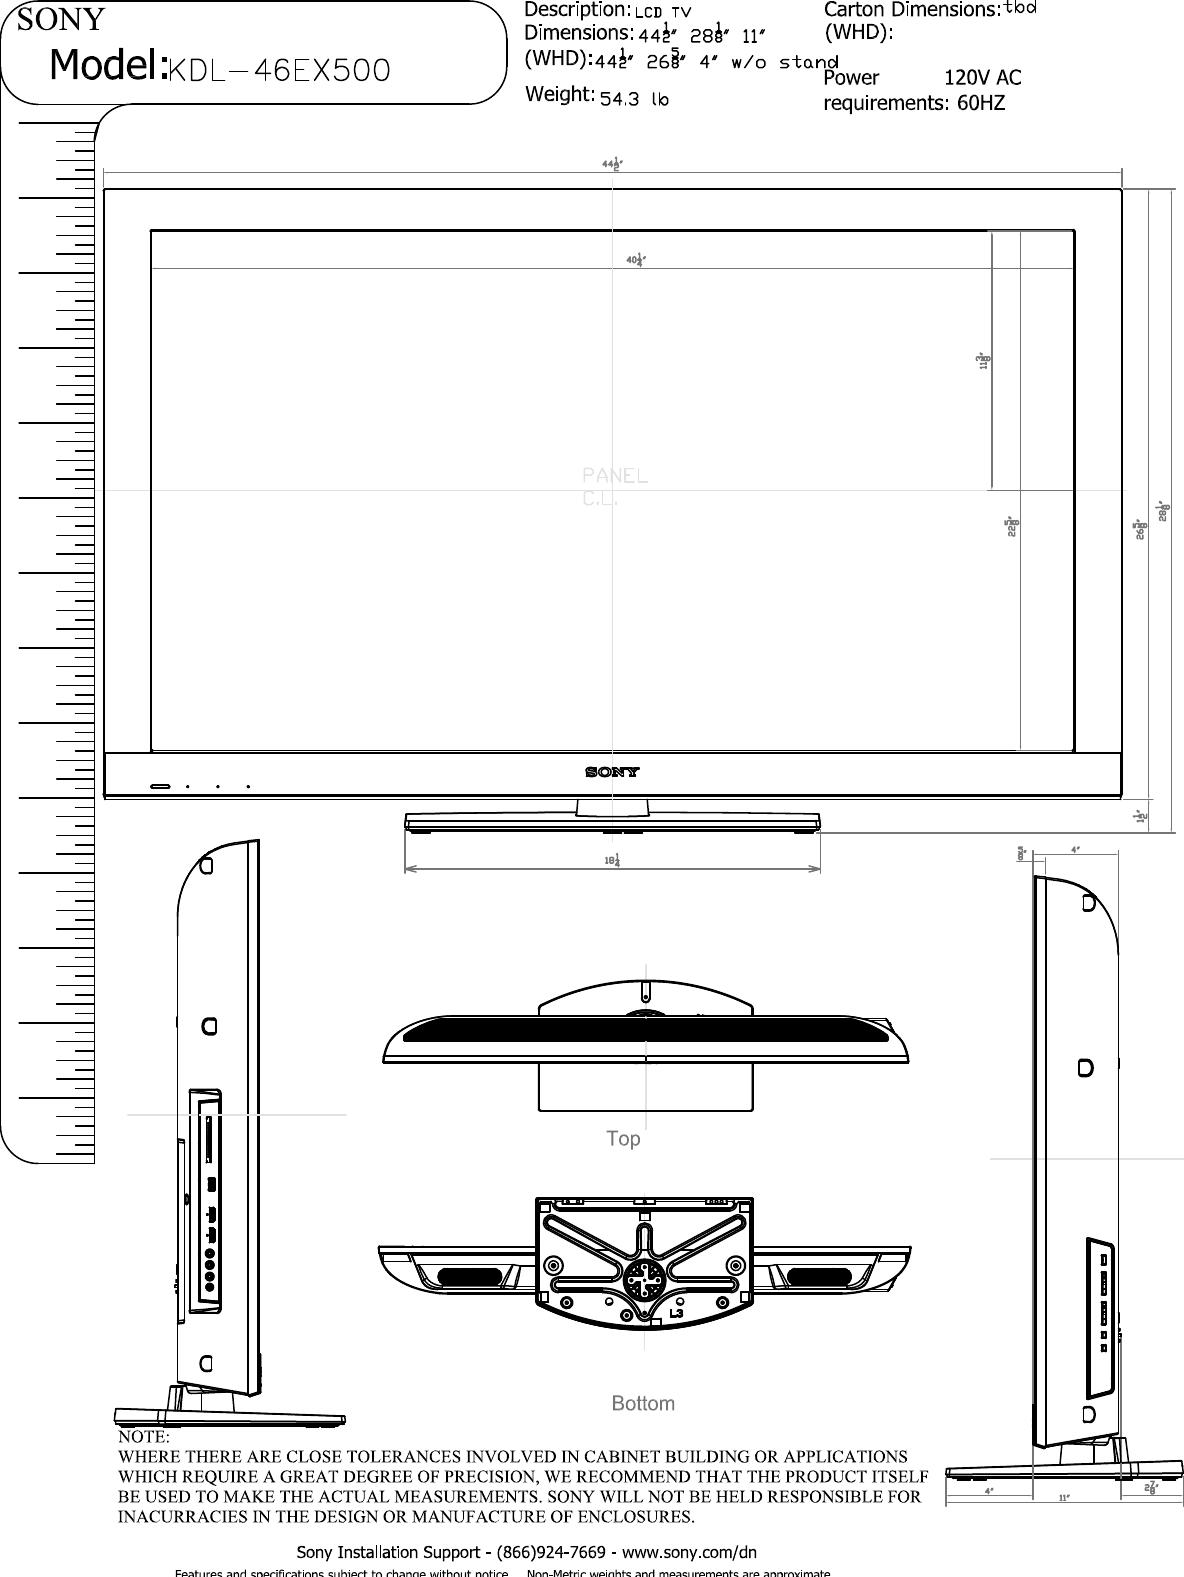 sony kdl 46ex500 layout1 user manual dimensions diagram kdl46ex500 rh usermanual wiki